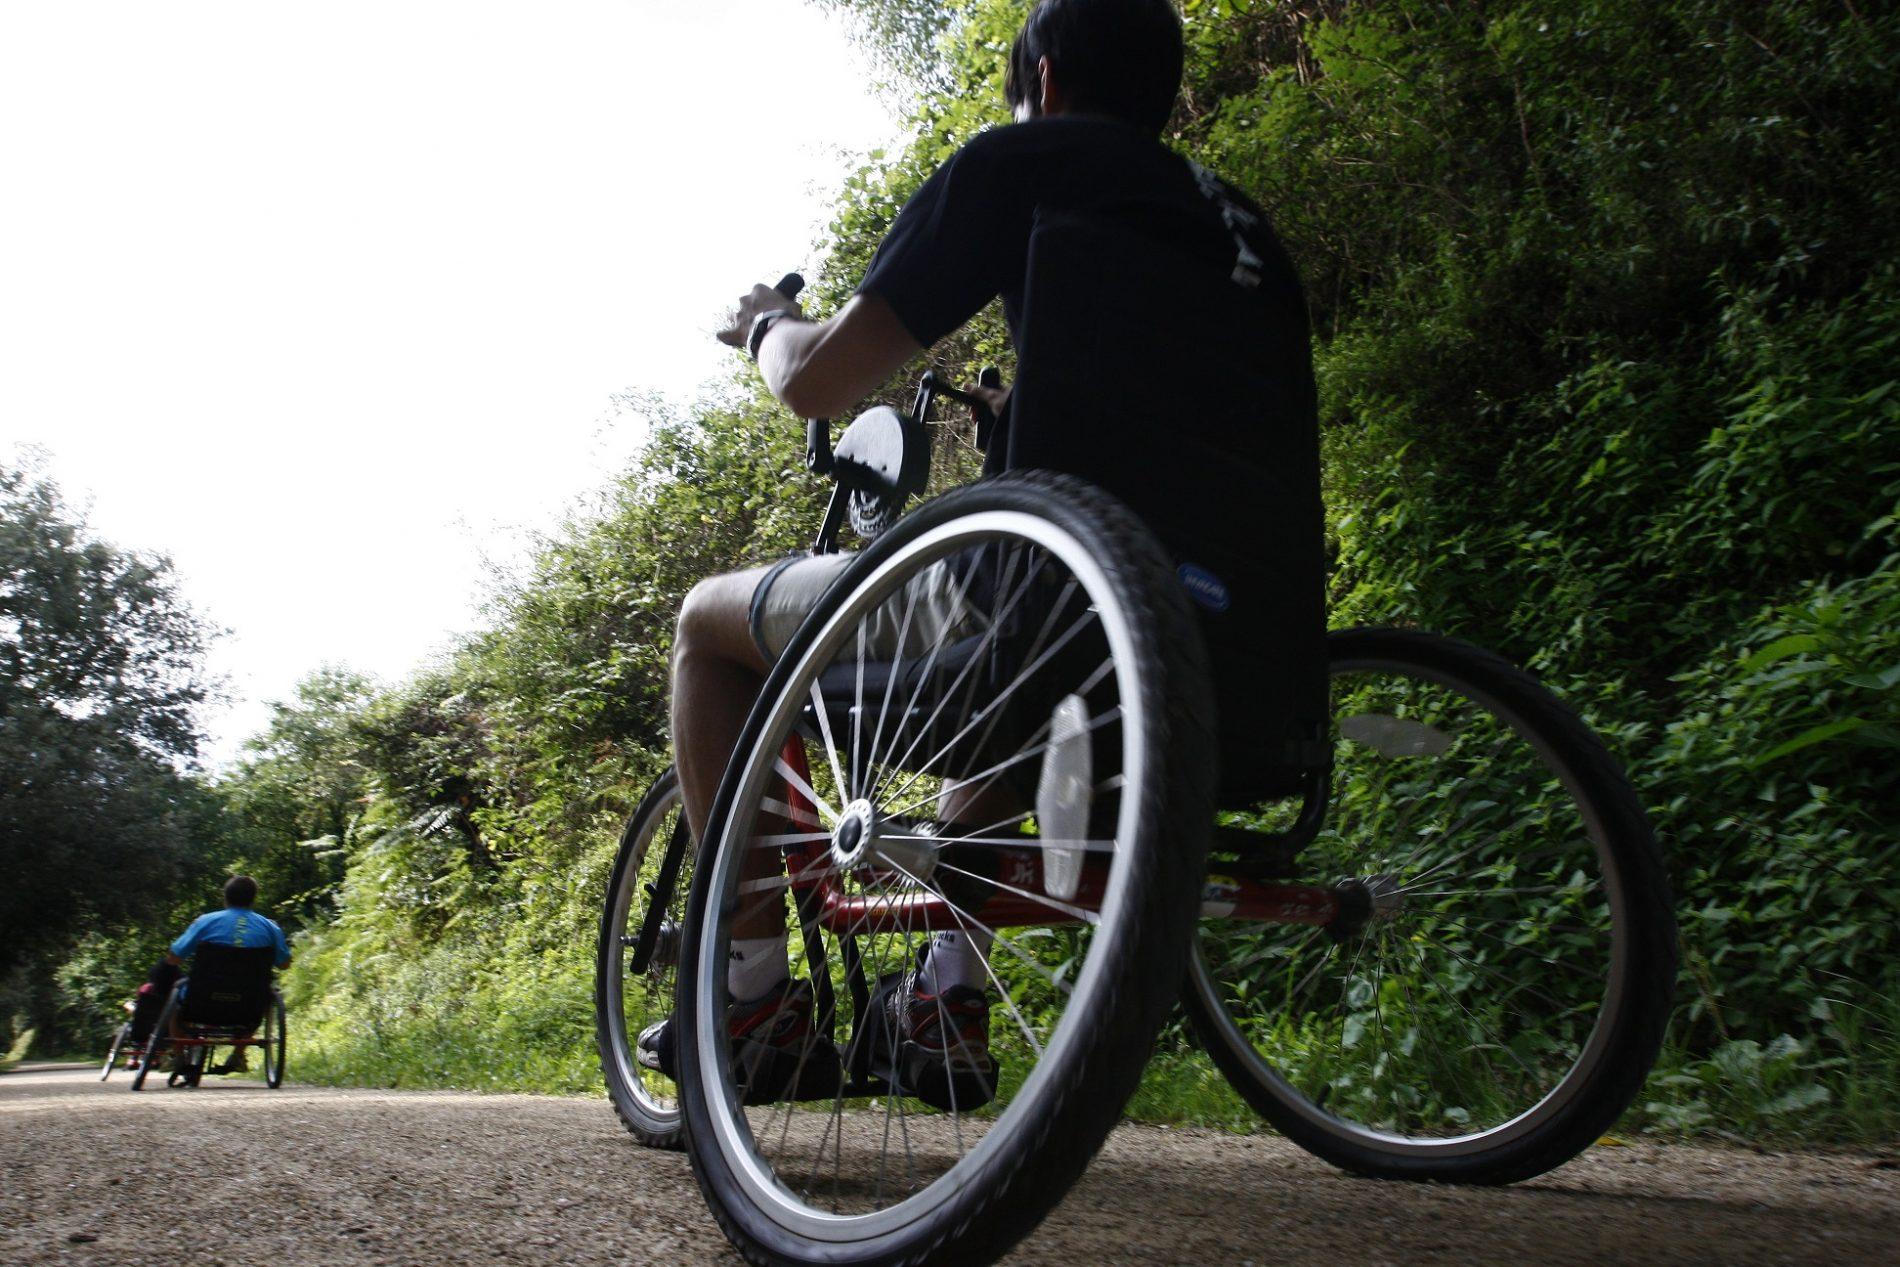 Bicicleta adaptada handbike